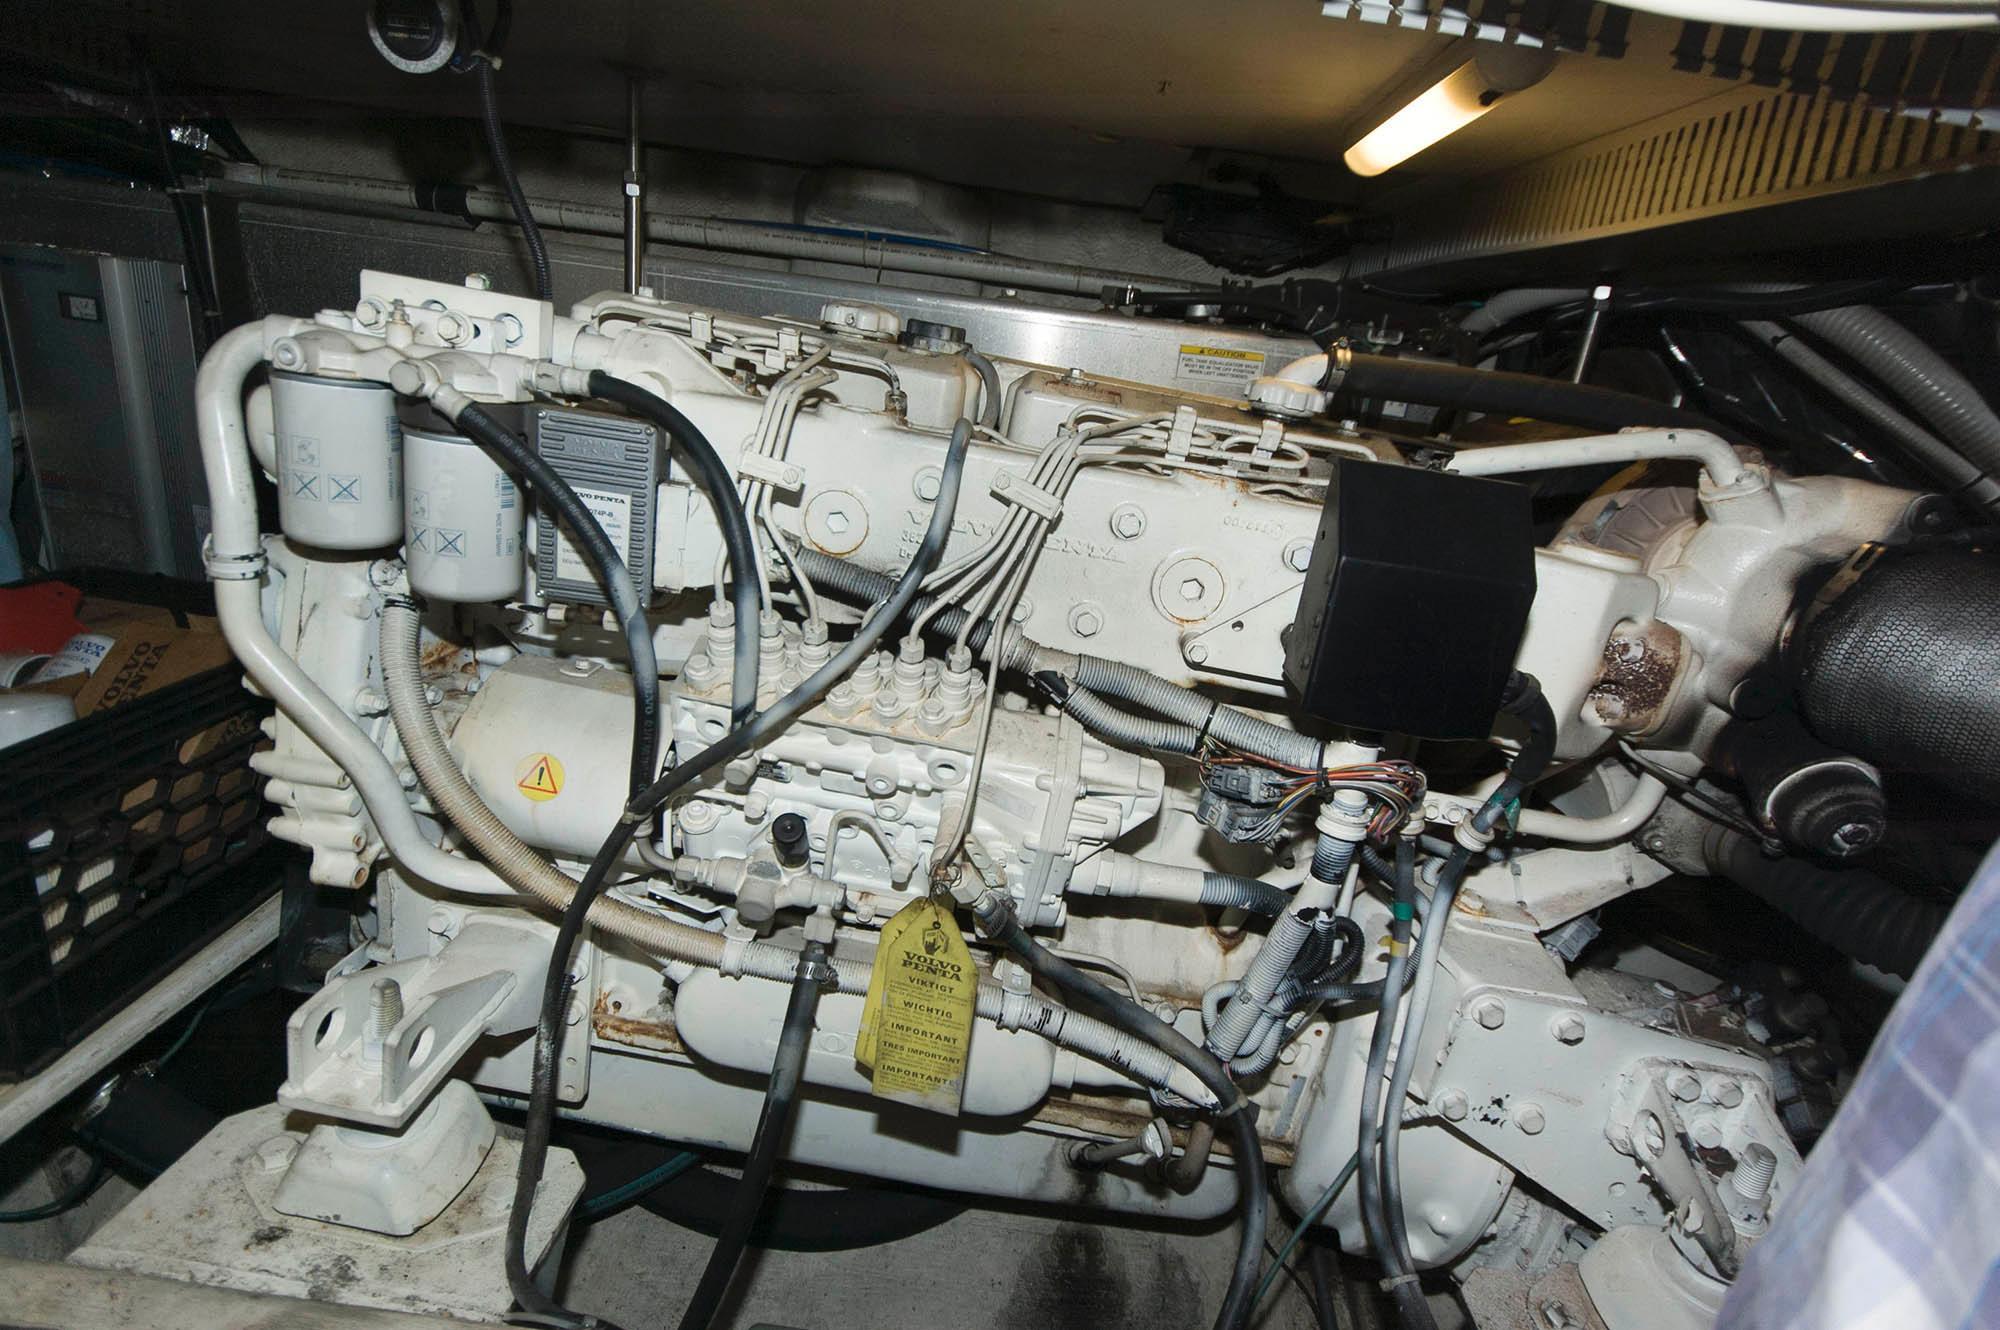 M 5599 VR Knot 10 Yacht Sales